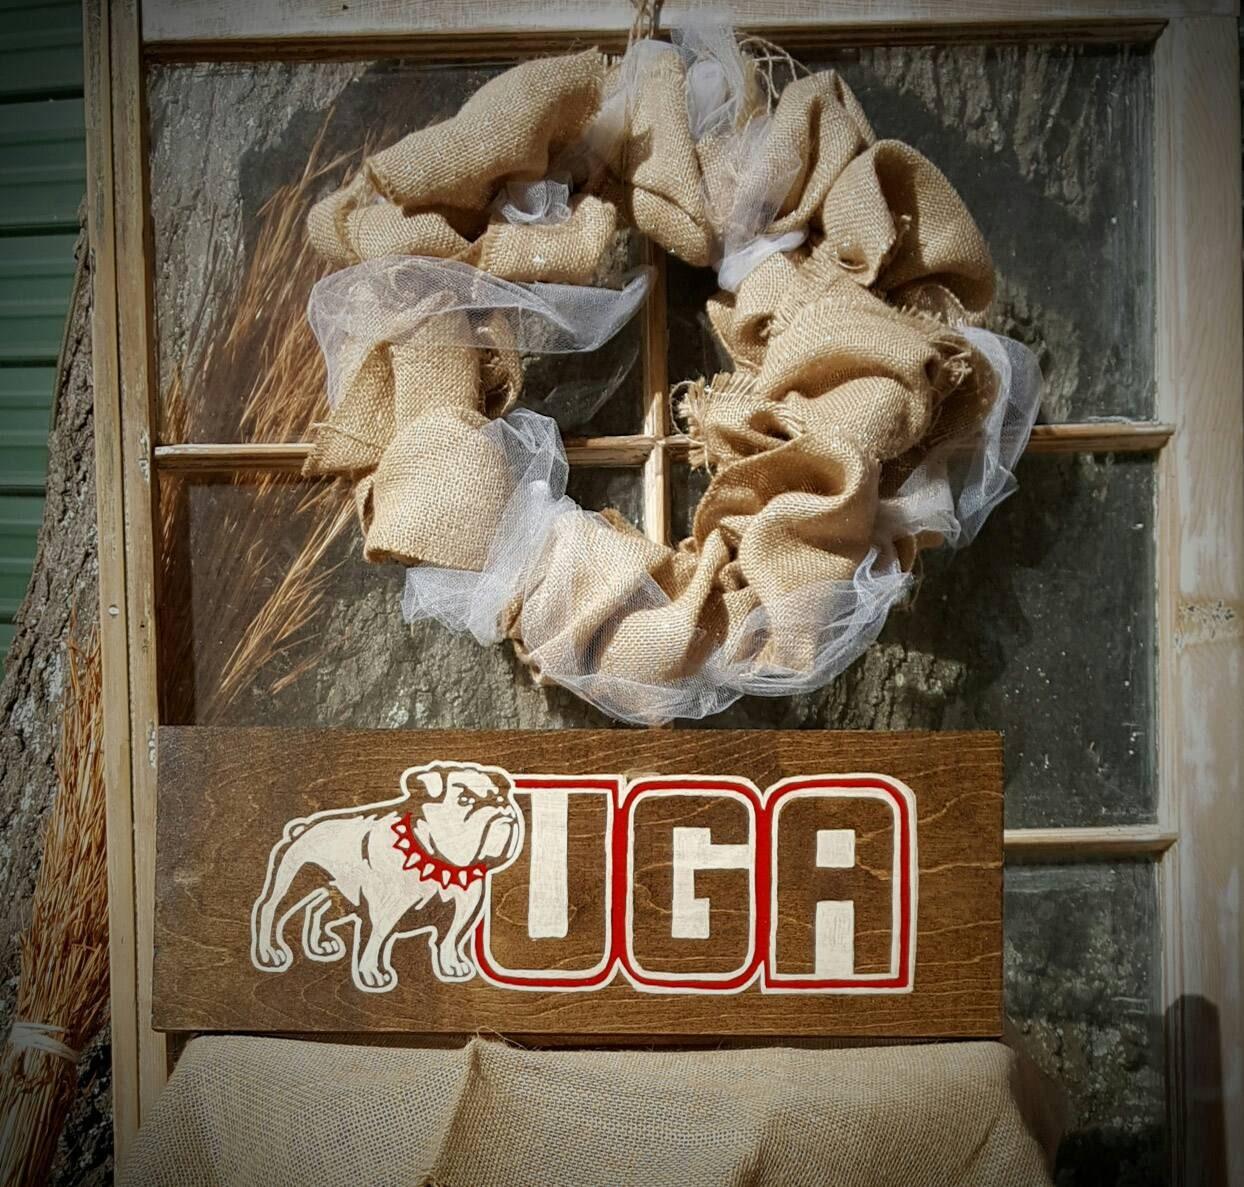 UGA UGA Decor Home Decor Hand Painted Wood Sign By